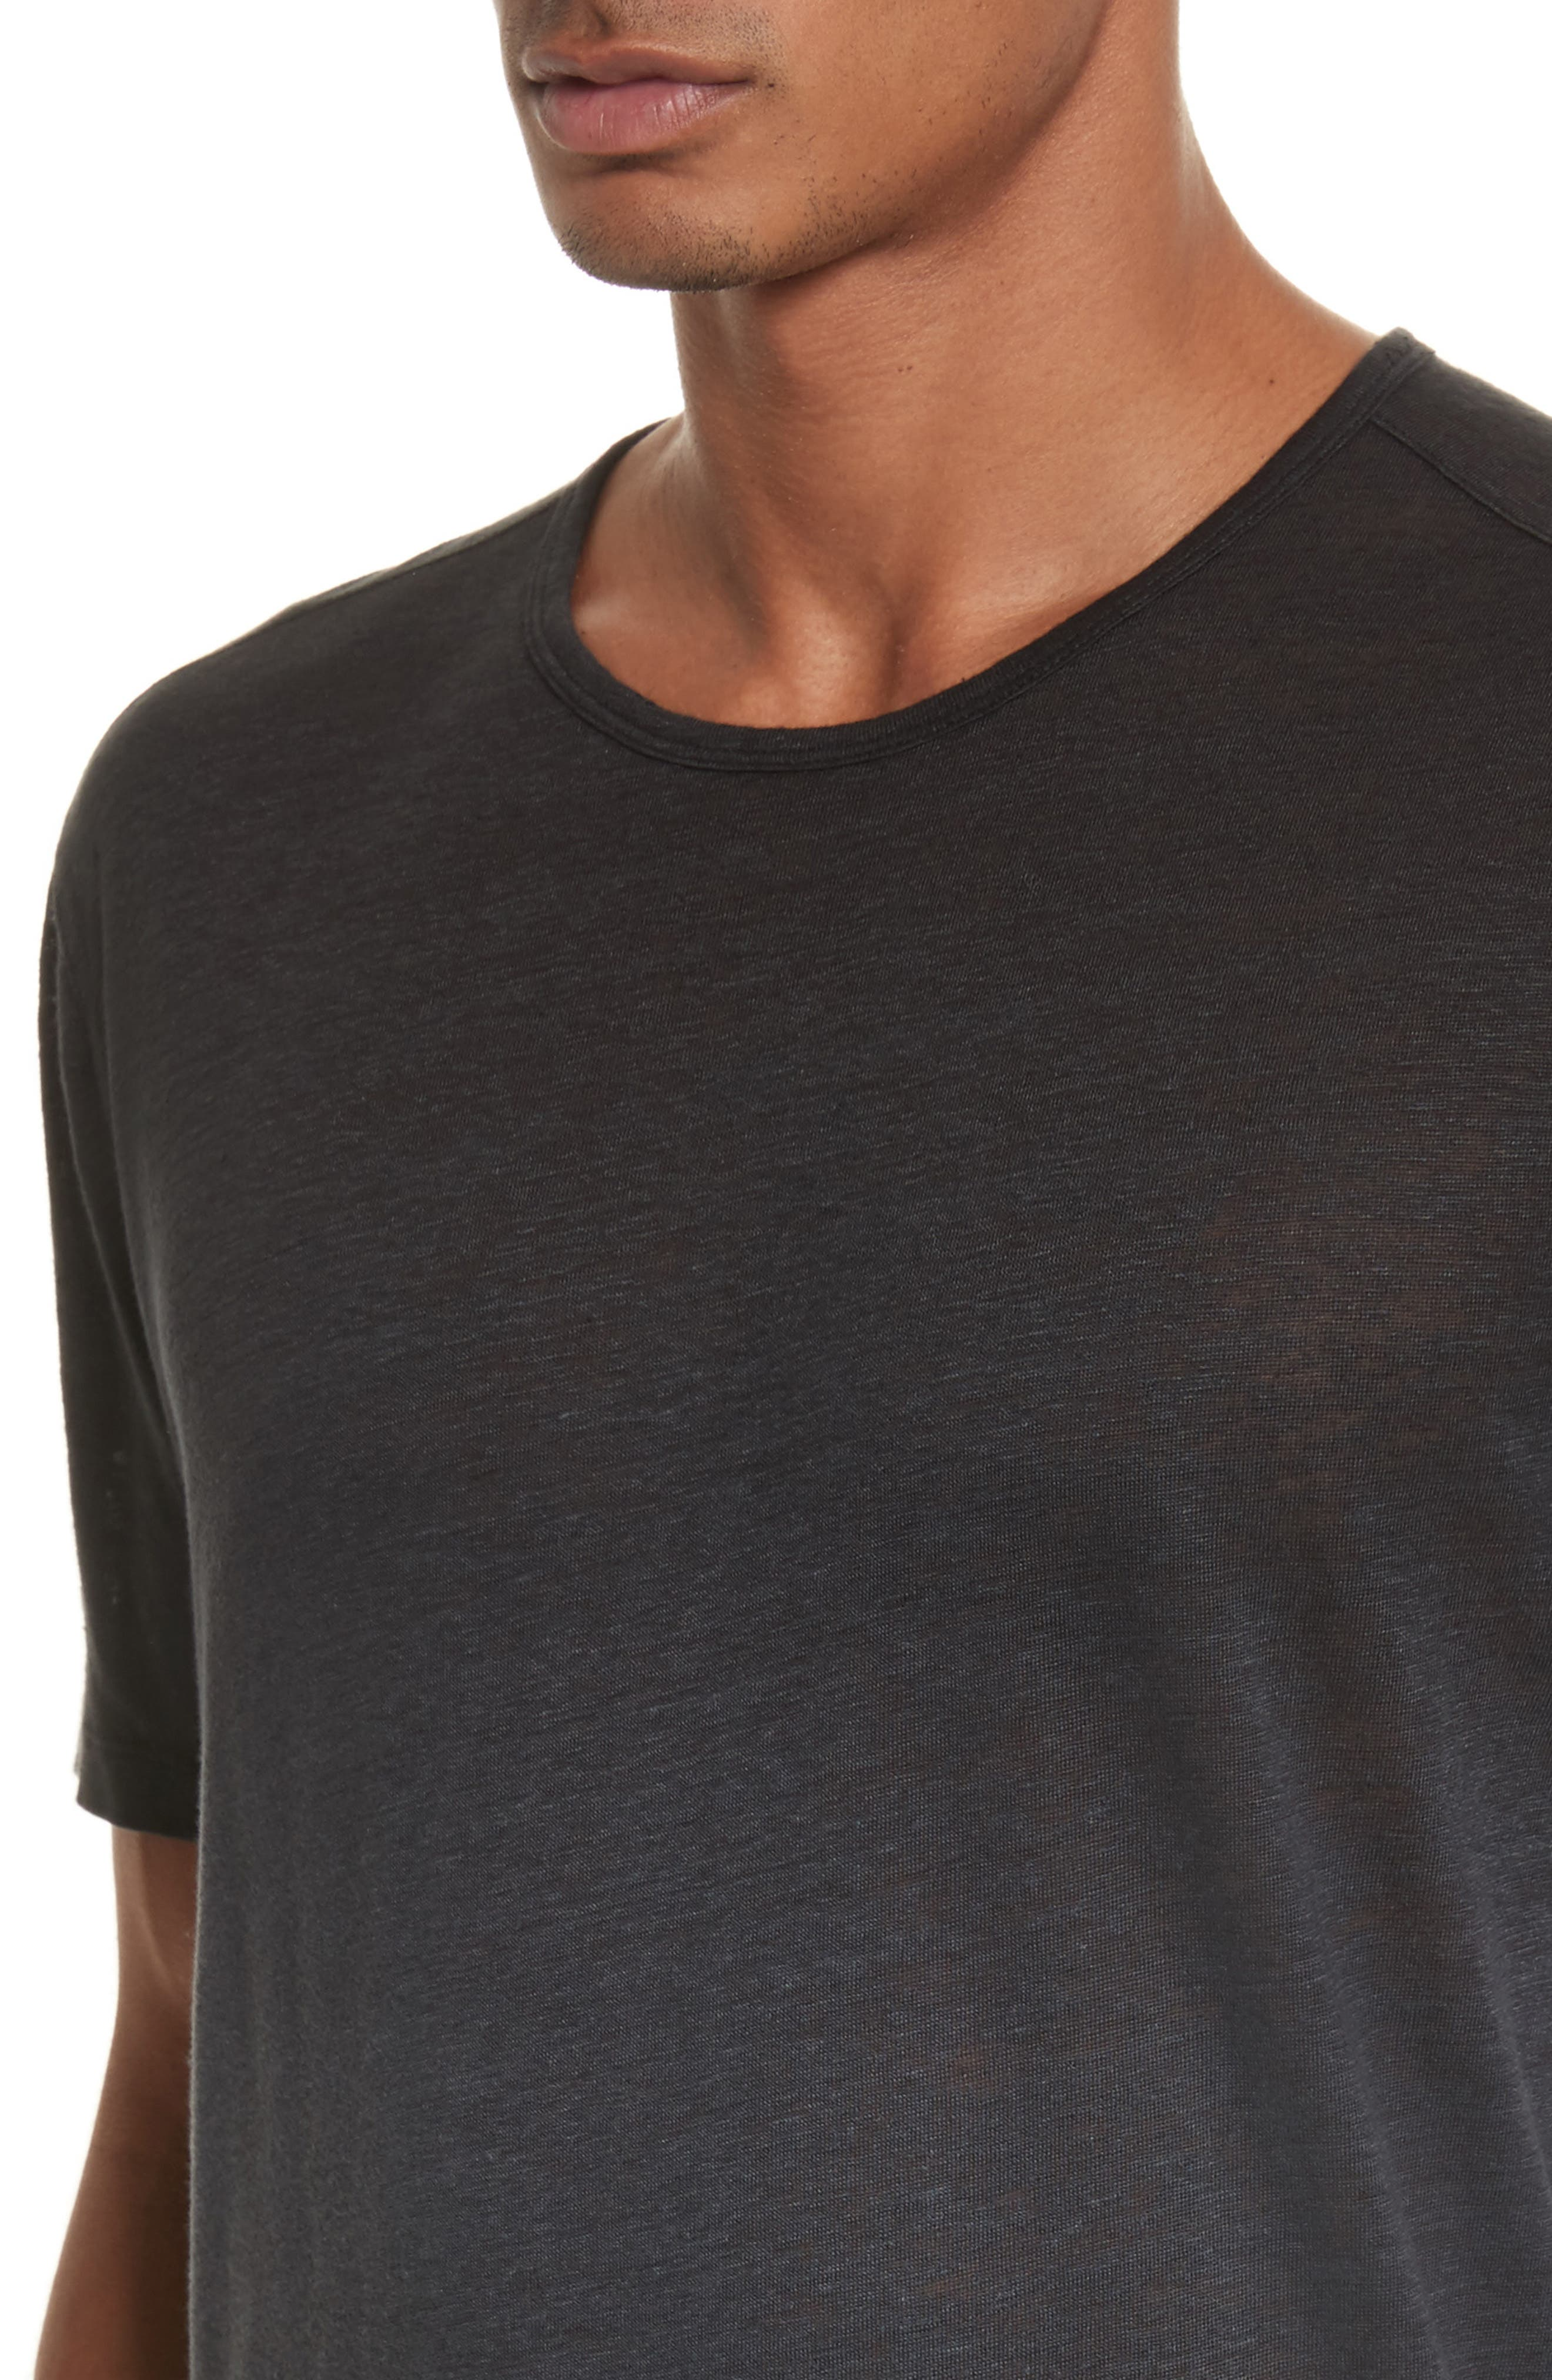 Dip Dyed Linen T-Shirt,                             Alternate thumbnail 4, color,                             001